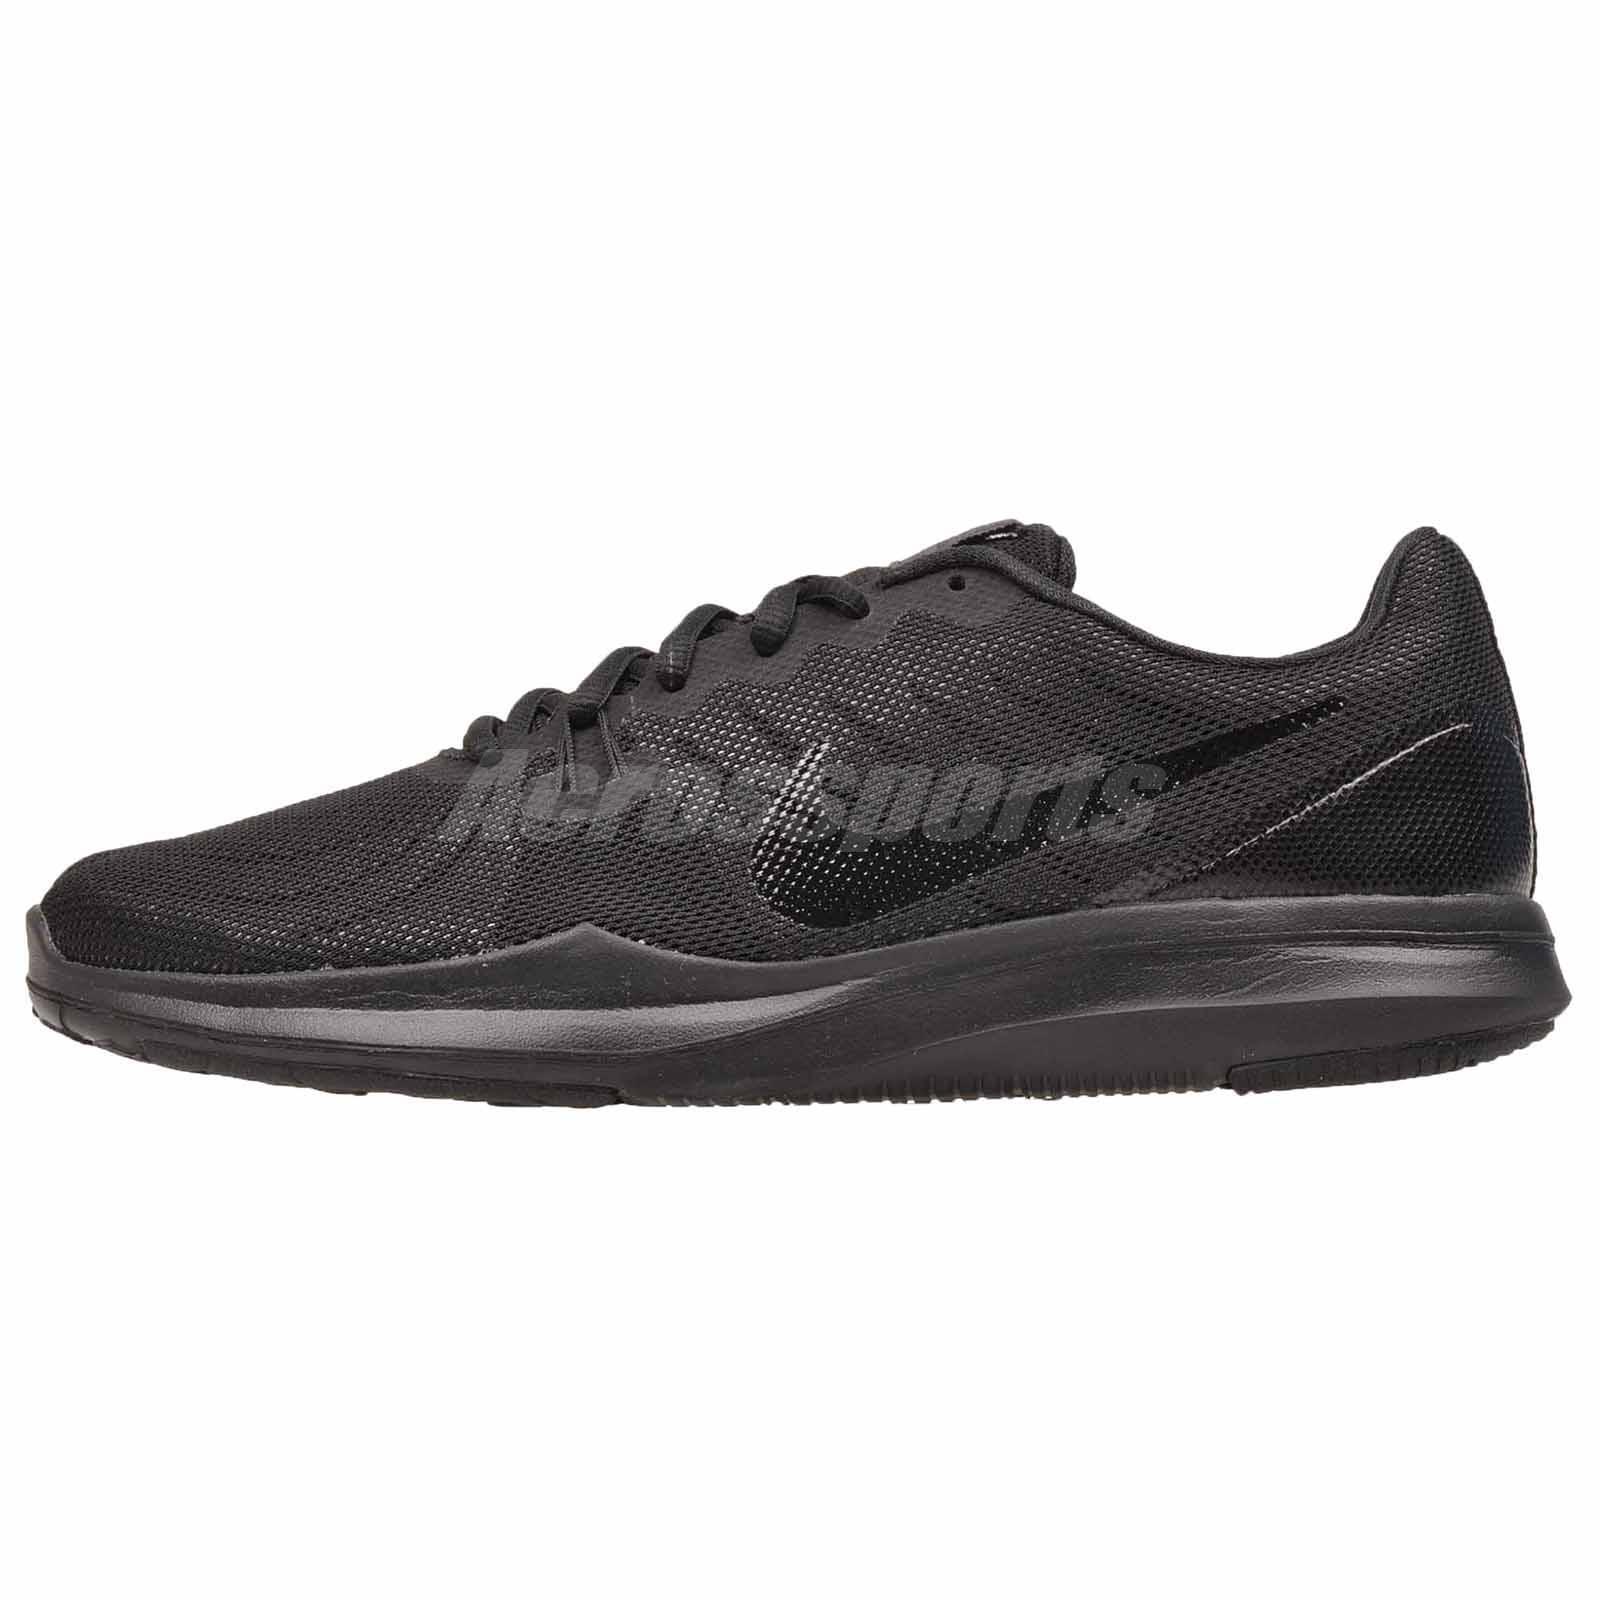 Nike W In-Season TR 7 Cross Training Womens Shoes Black Anthracite 909009-002